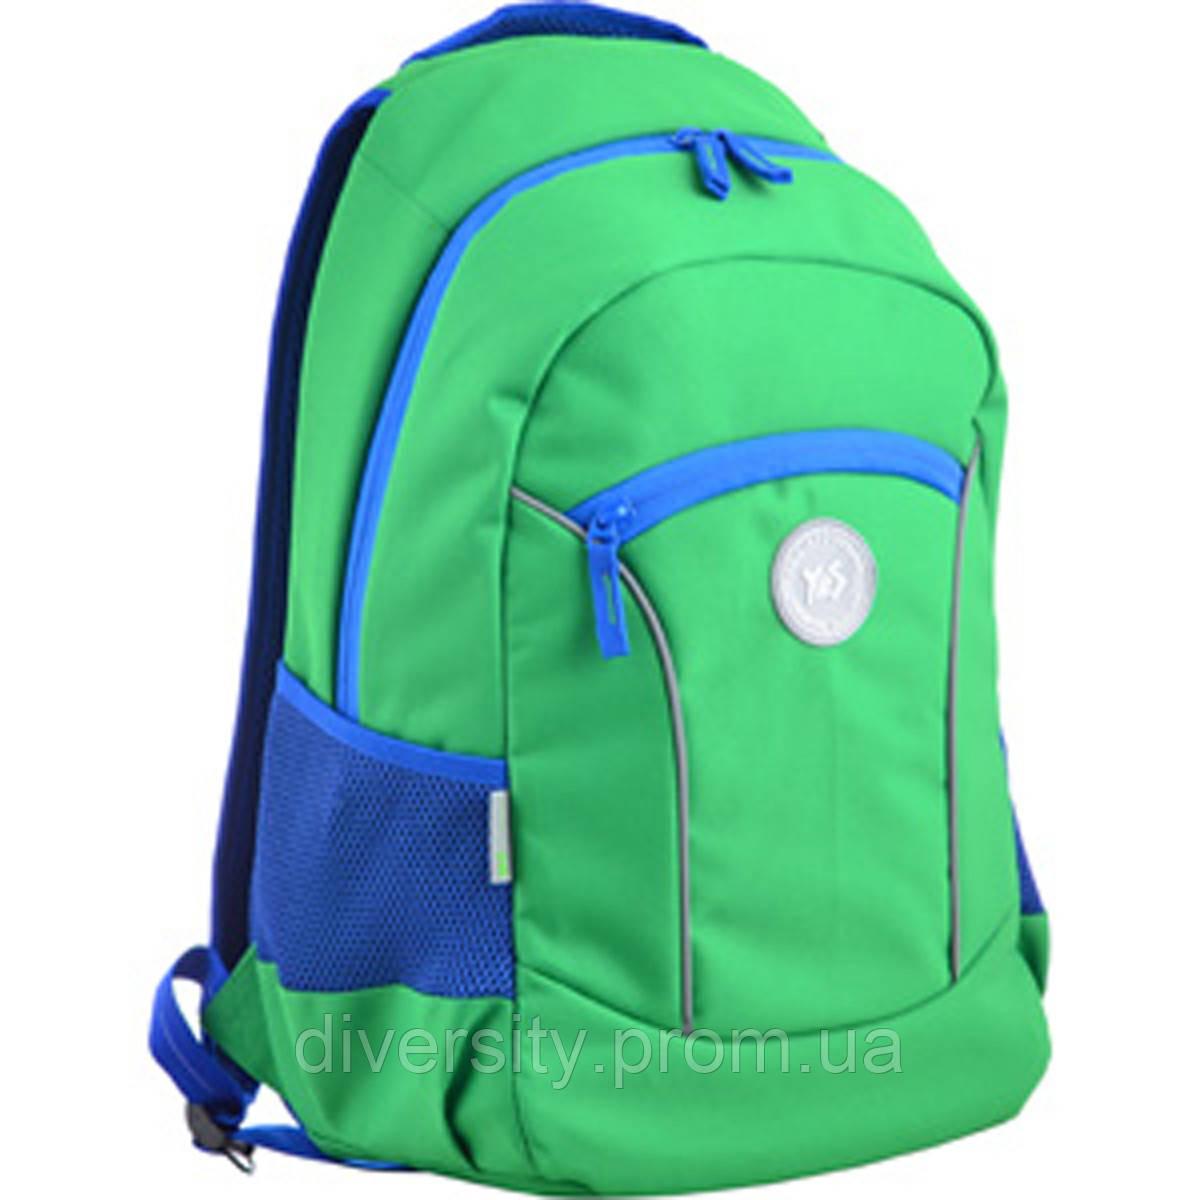 Молодежный рюкзак YES  Т-39 Coolness, 48*30*16